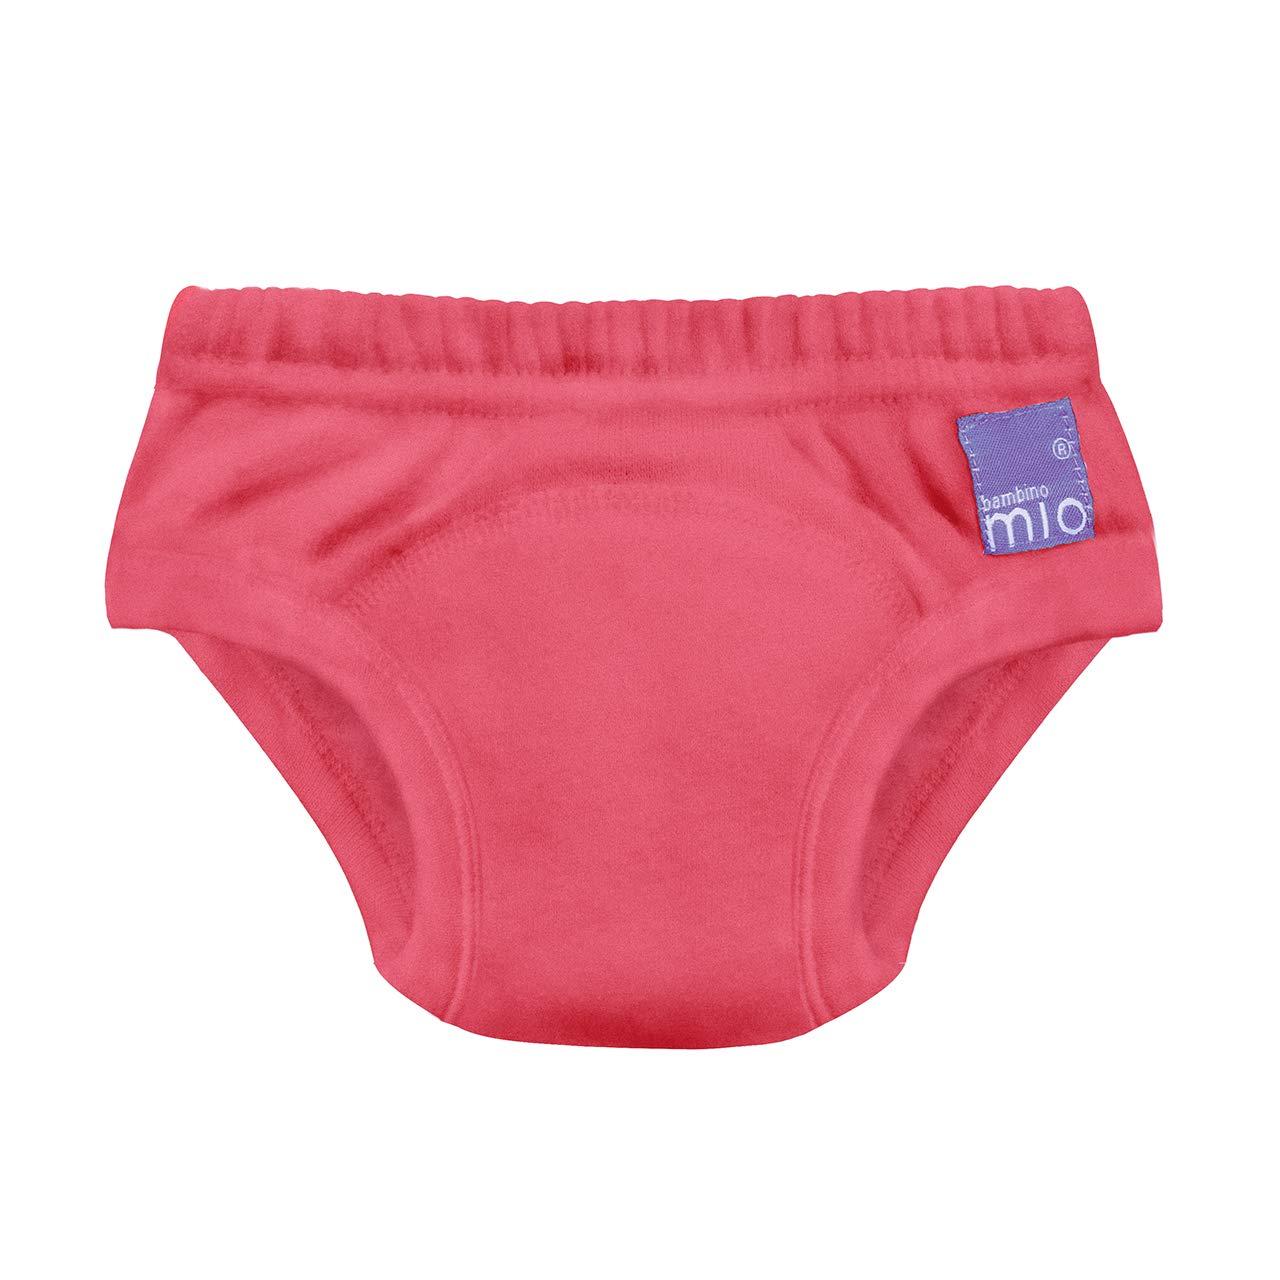 Bambino Mio Bambino Mio, Potty Training Pants, Ruby, 3+ Years